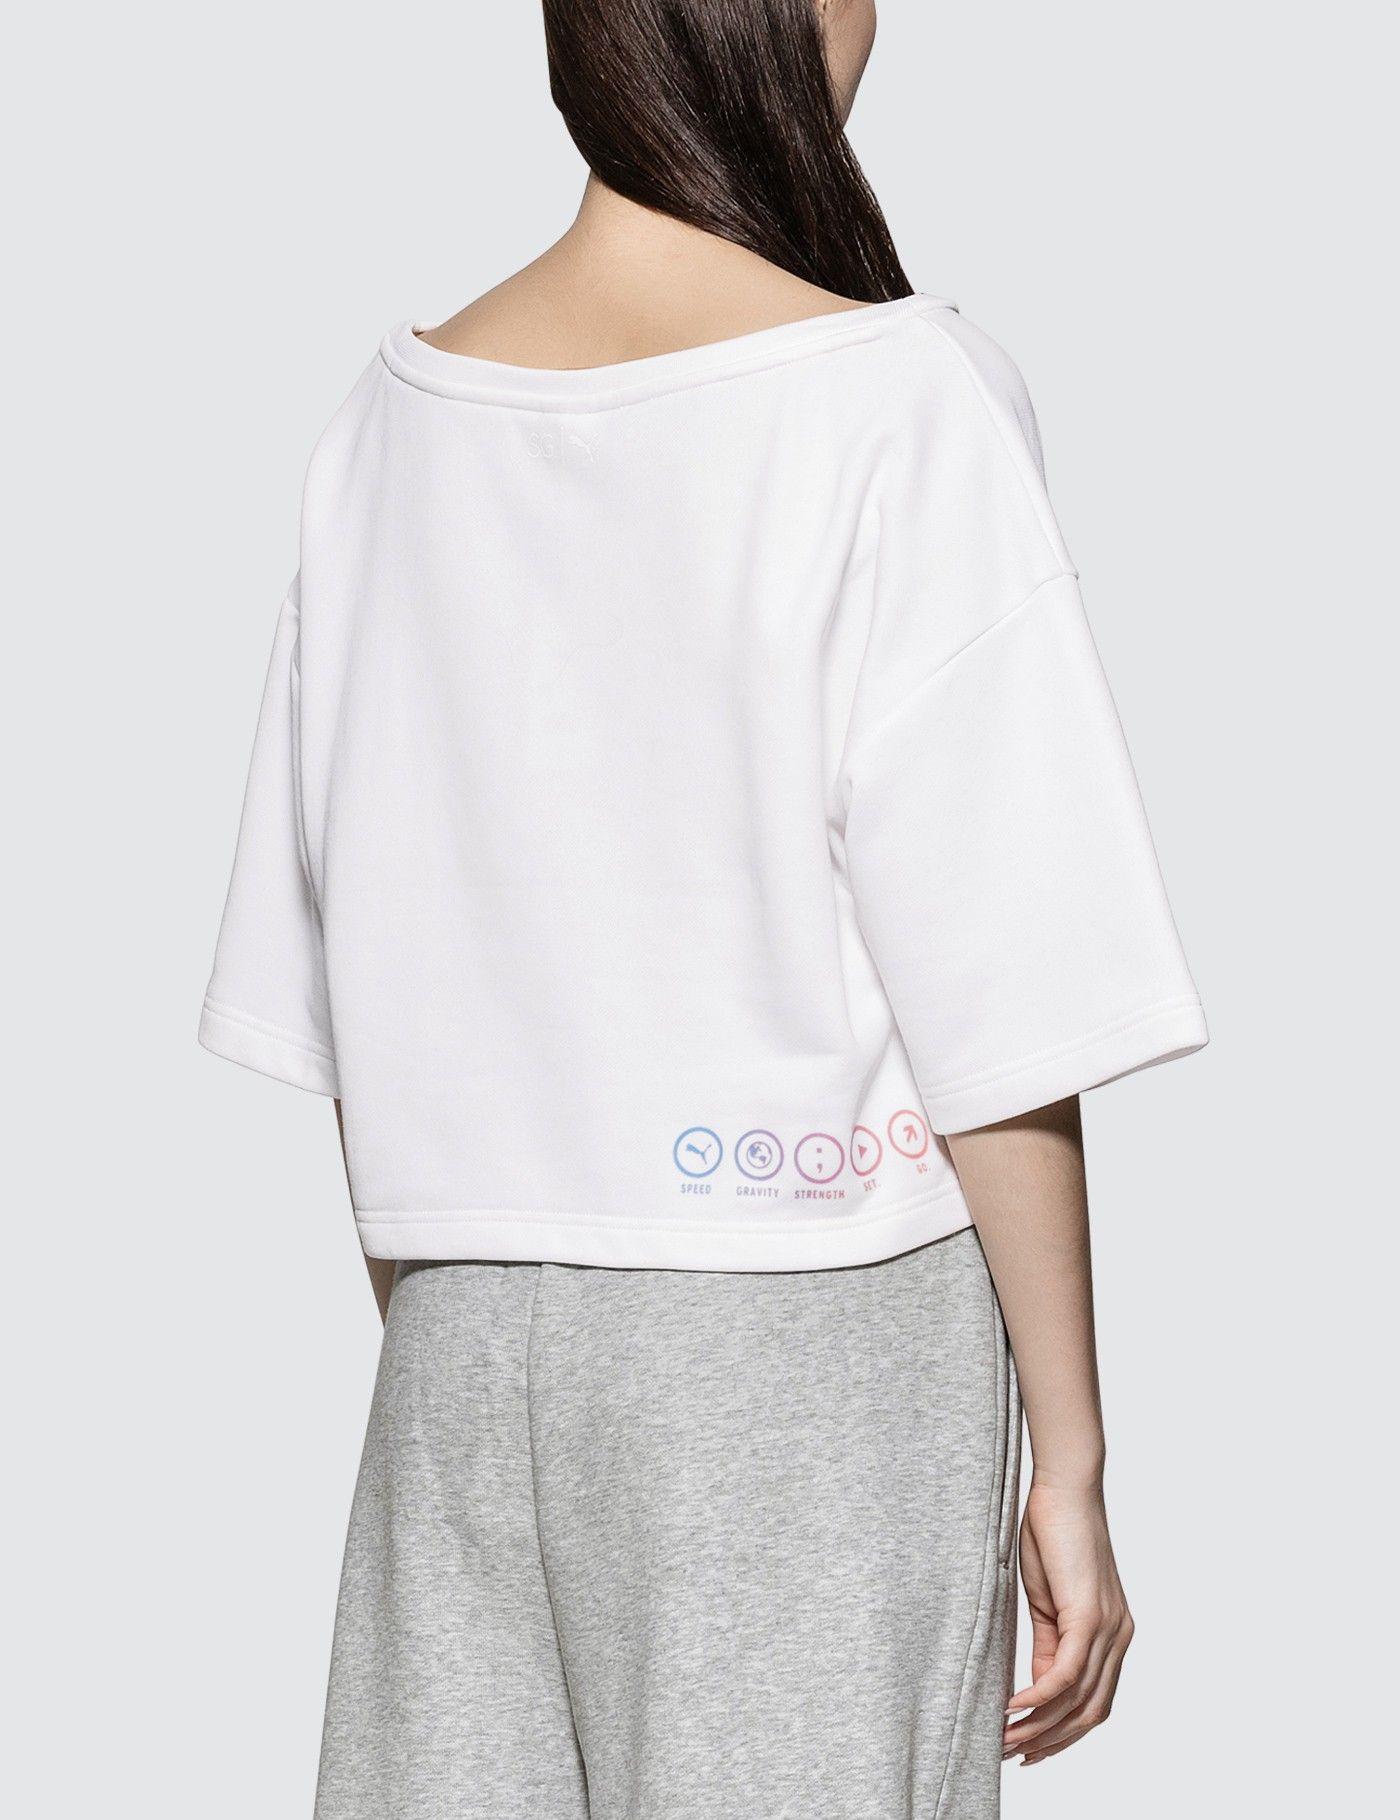 Predownload: Puma Puma X Selena Gomez Sweatshirt Hbx Shopping Outfit Puma X Sweatshirts [ 1820 x 1400 Pixel ]